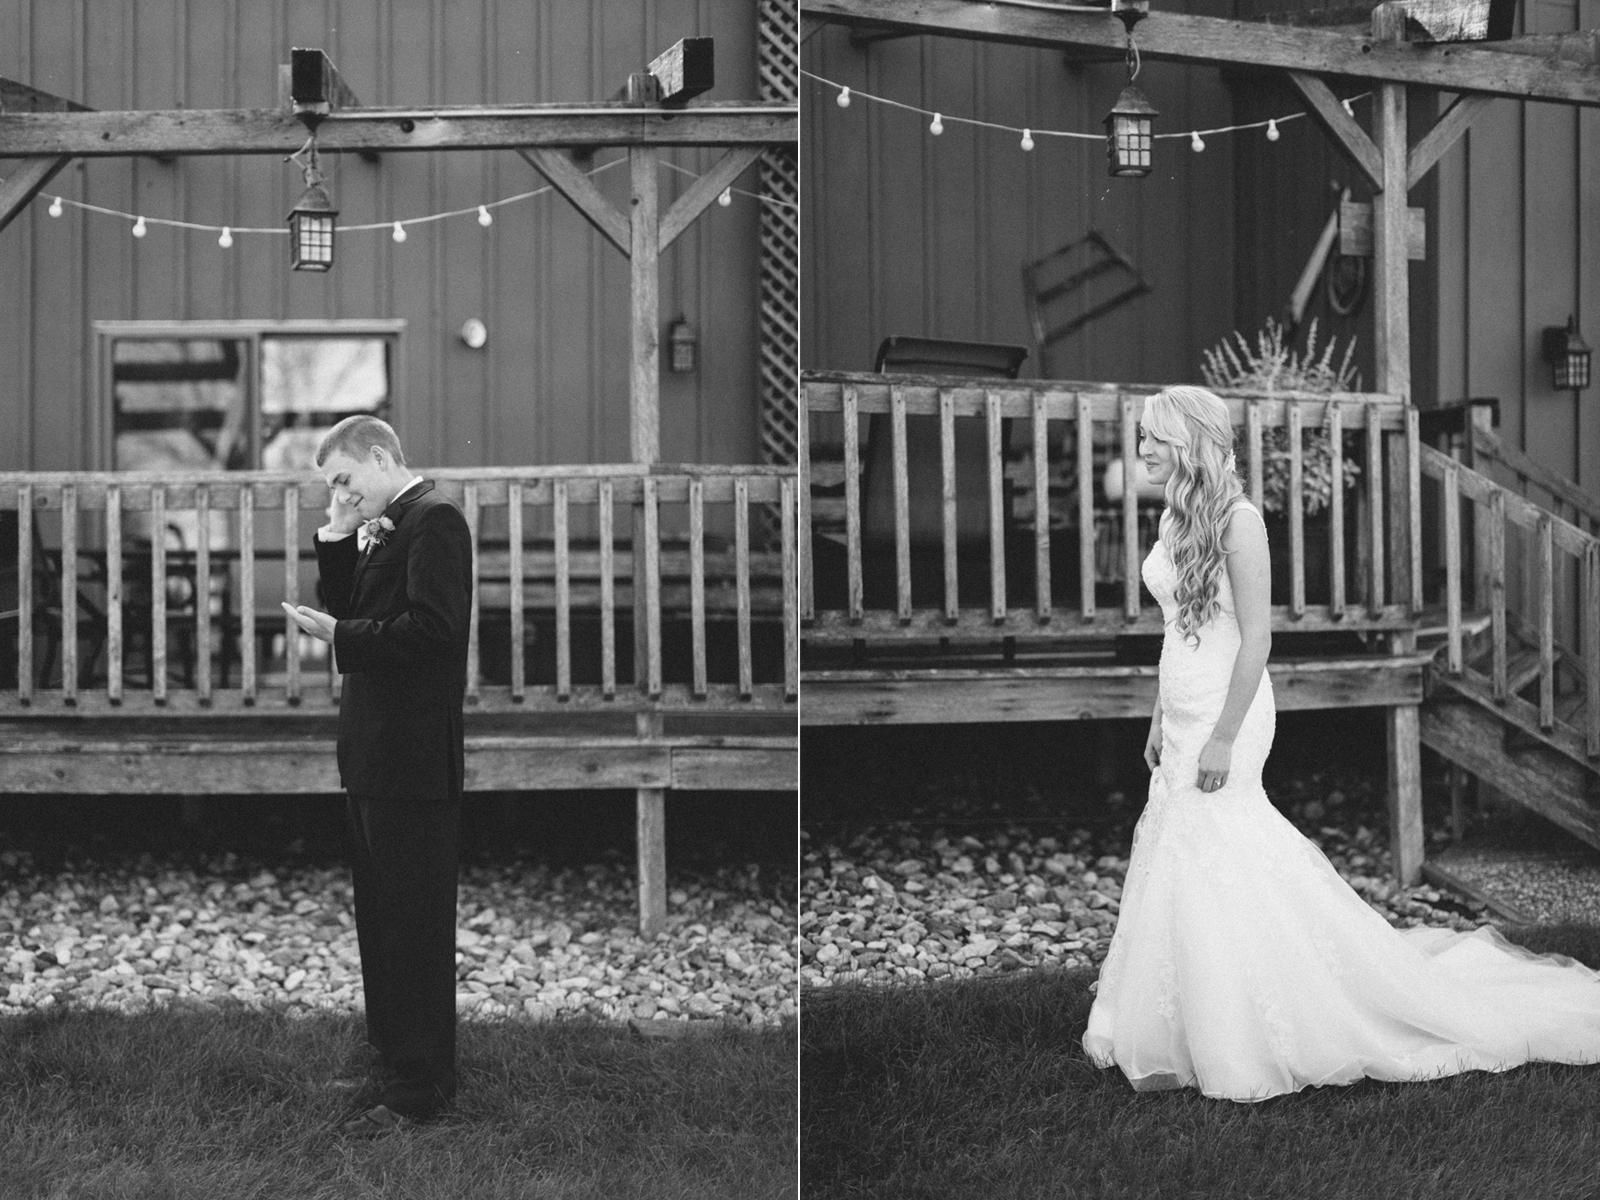 SiouxFalls_DesMoines_Wedding_Photographer_01.jpg